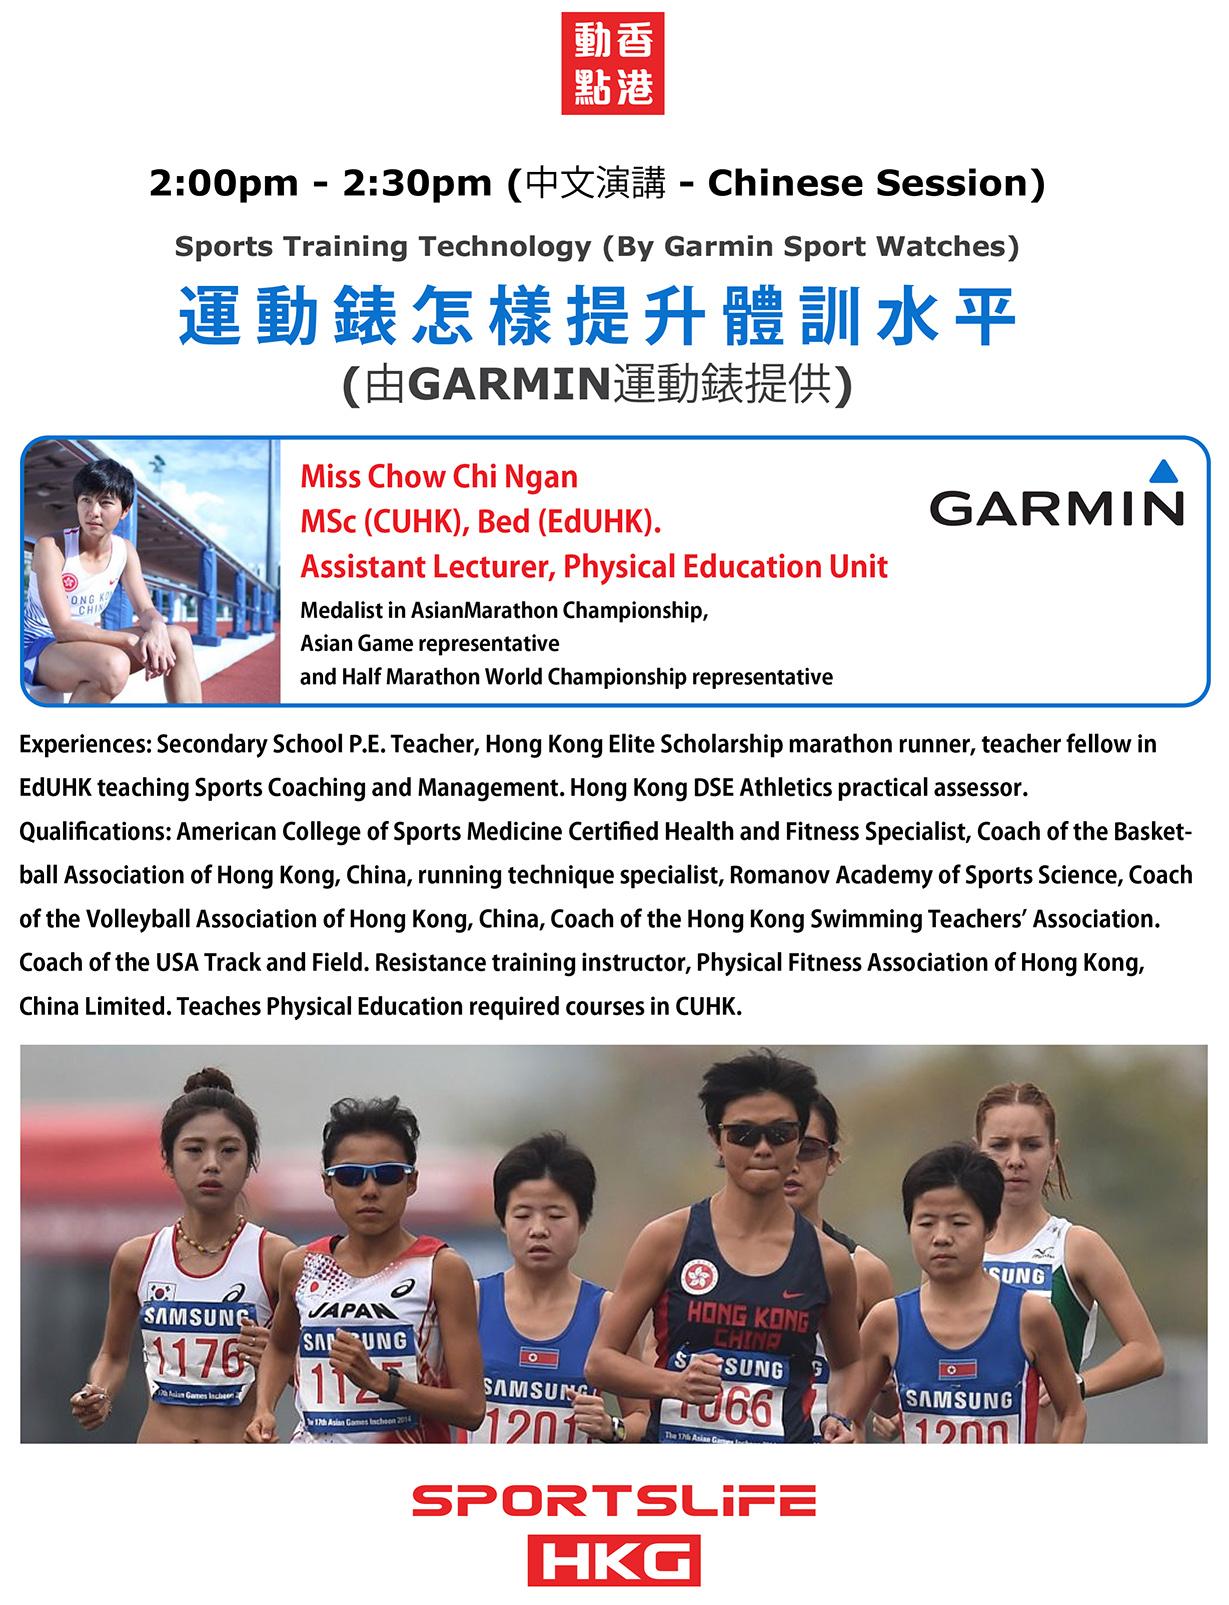 sportslife HKG Garmin